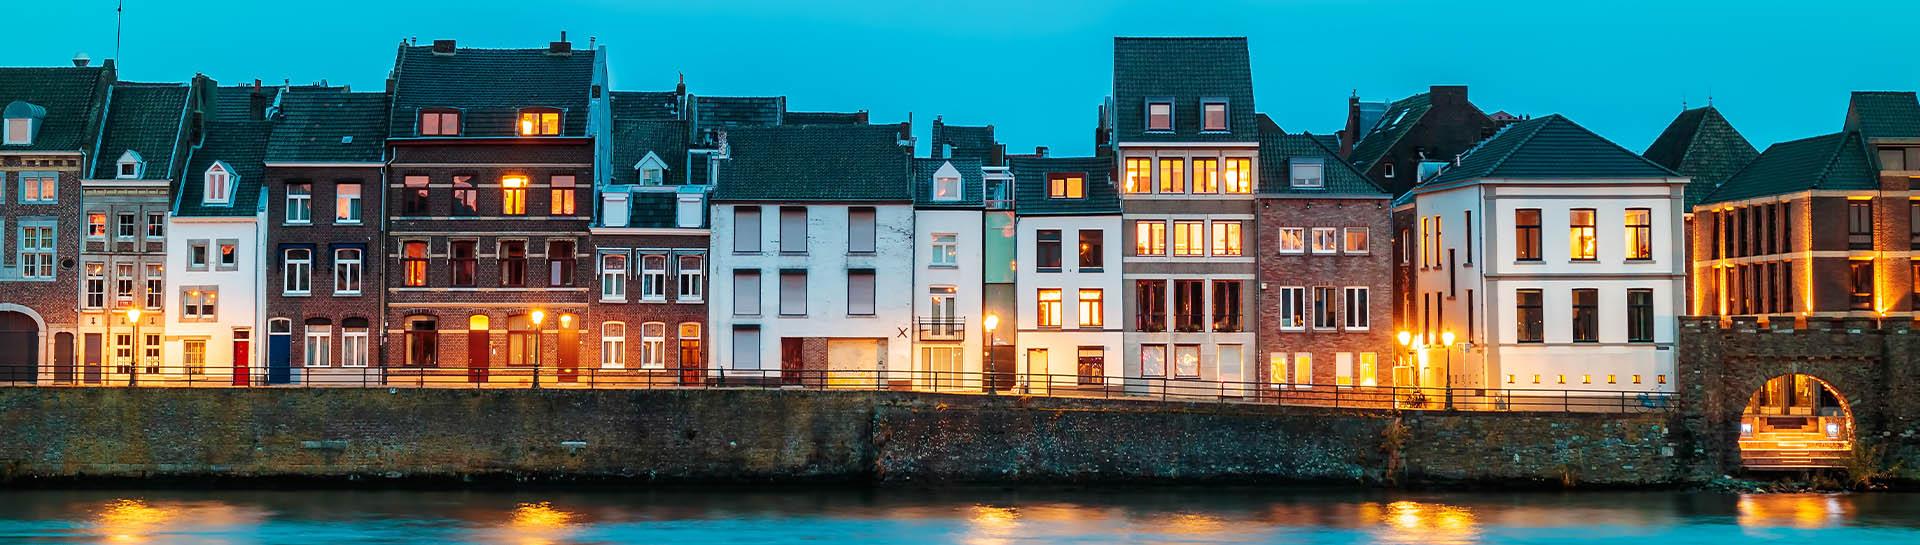 Oude en nieuwe gevels in Wyck Maastricht